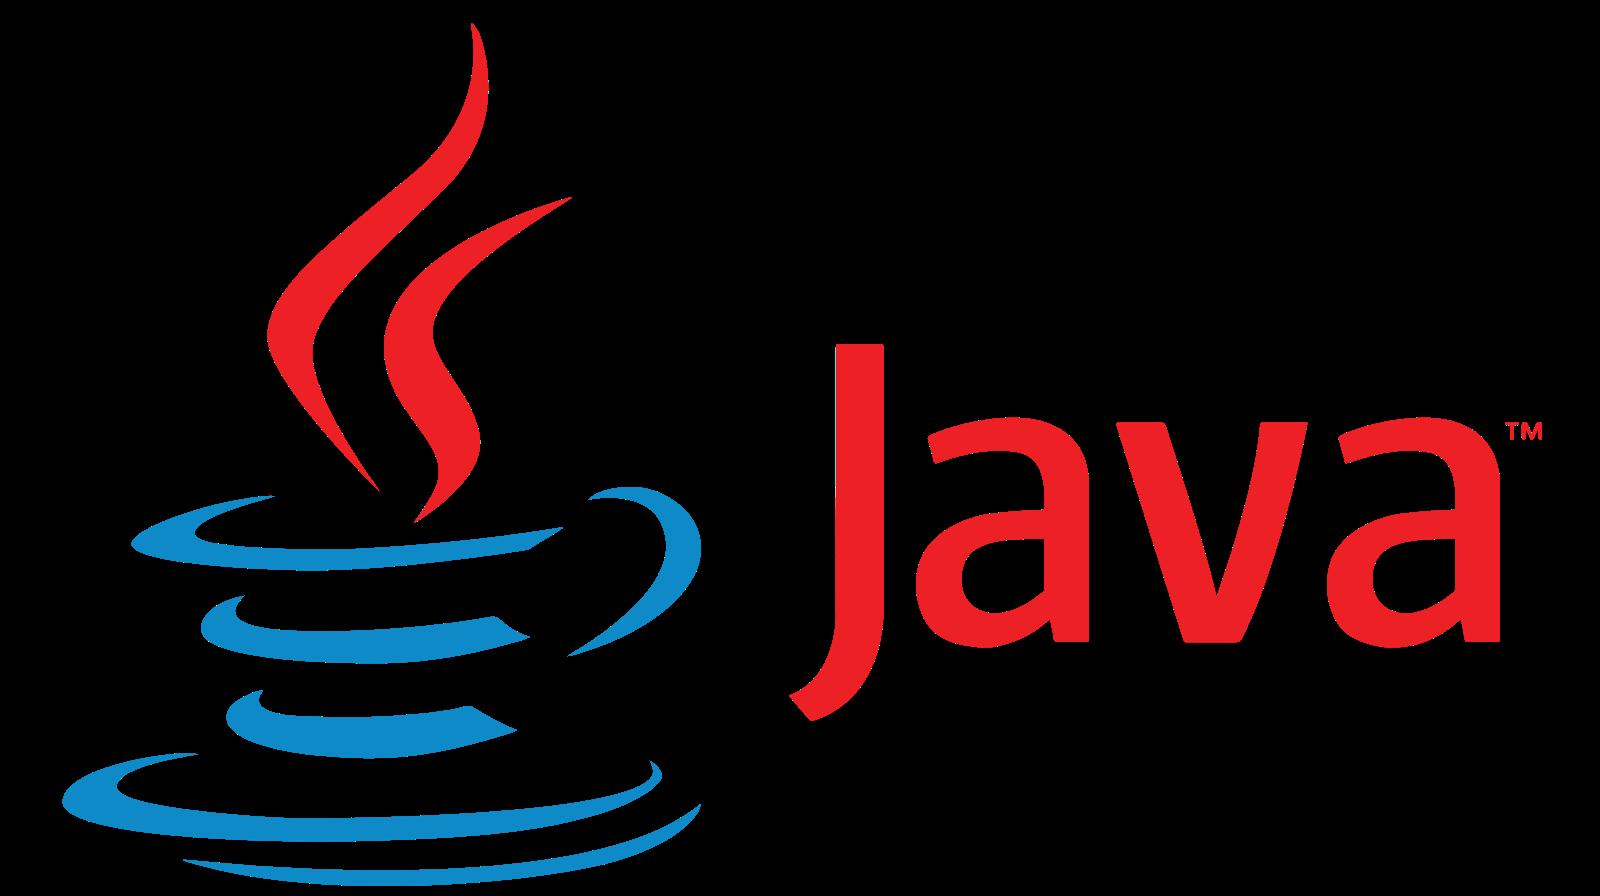 Java logo icon